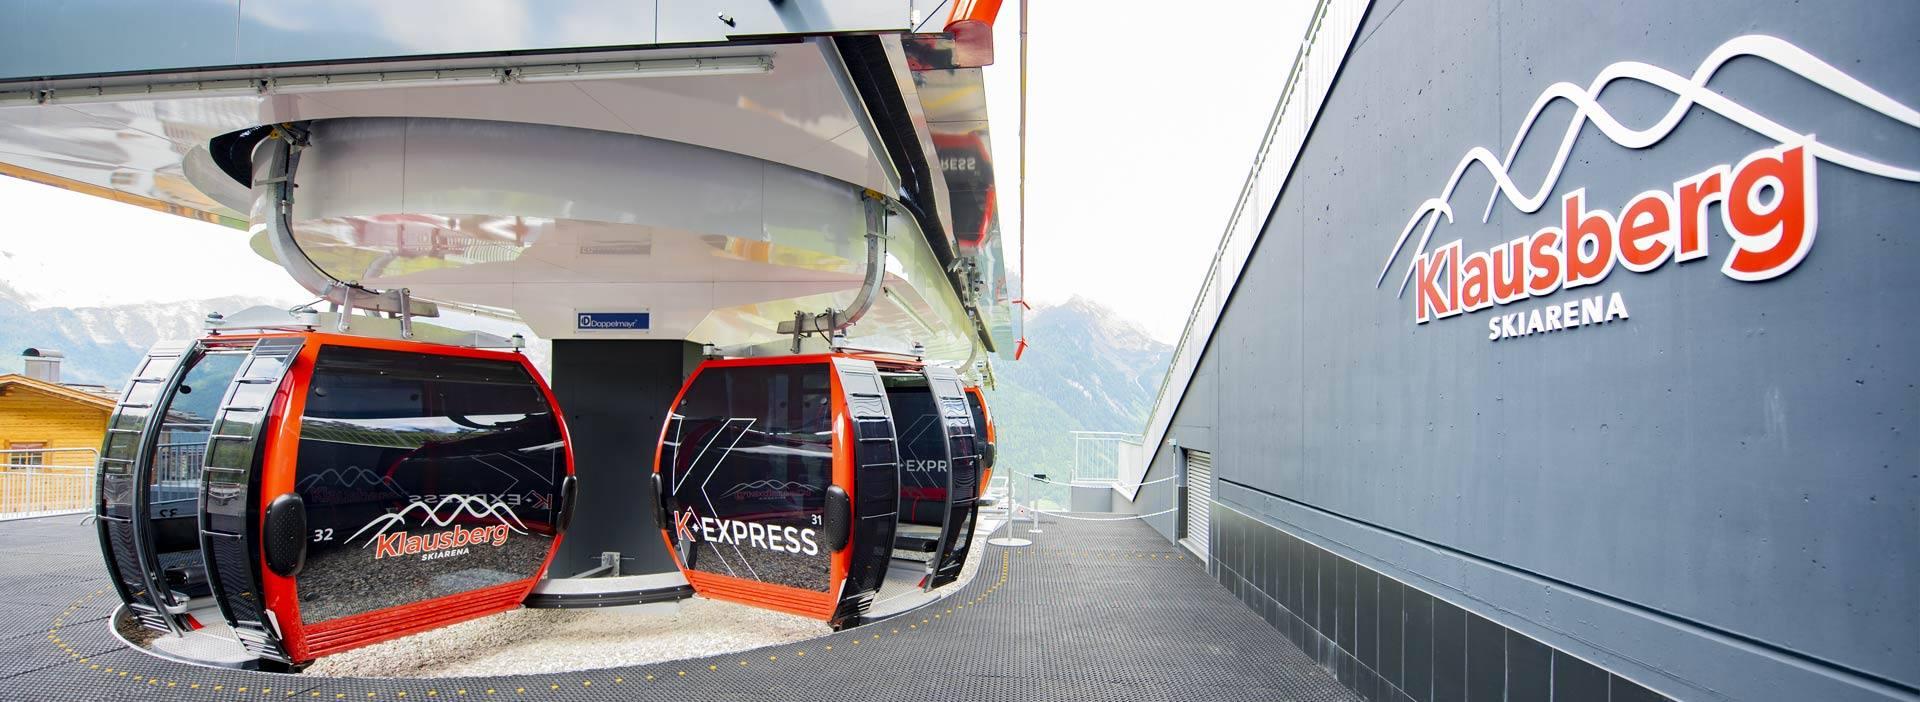 Kabinenbahn Klausberg Express